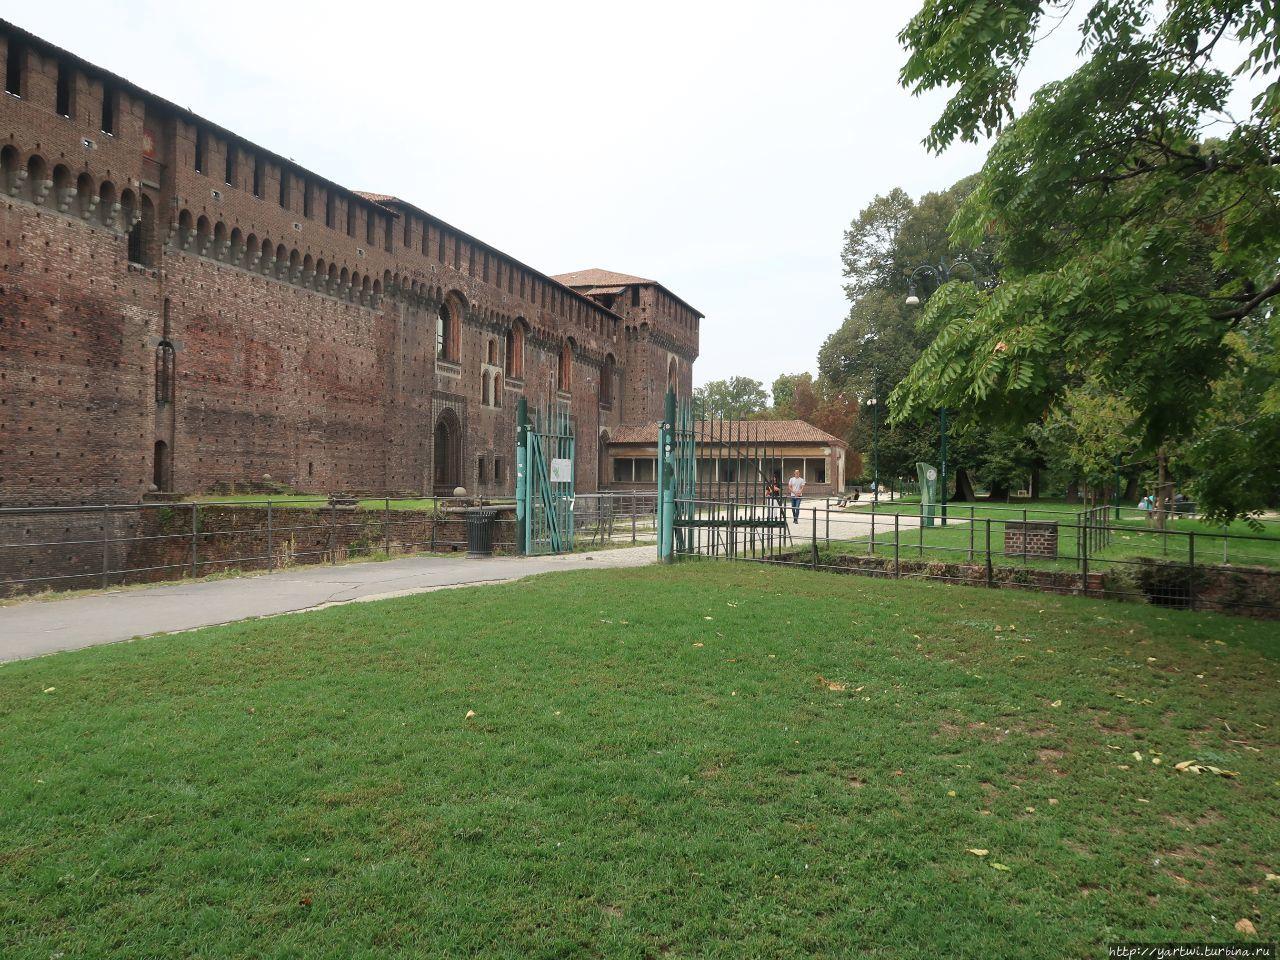 Миланский замок первонача